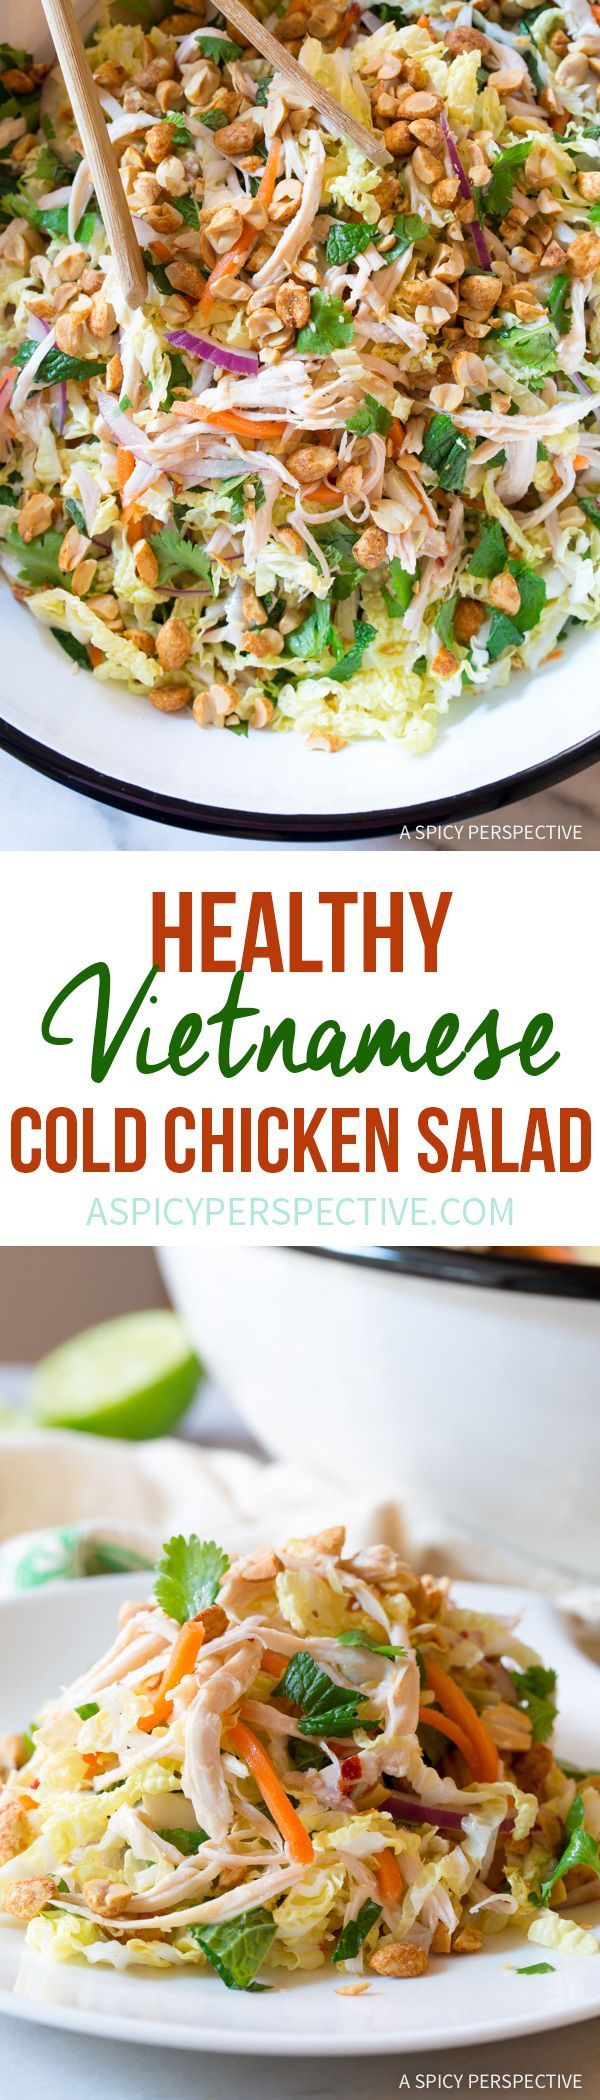 Vibrant Vietnamese Cold Chicken Salad (Goi Ga) #healthy #lowcarb #paleo via @spicyperspectiv